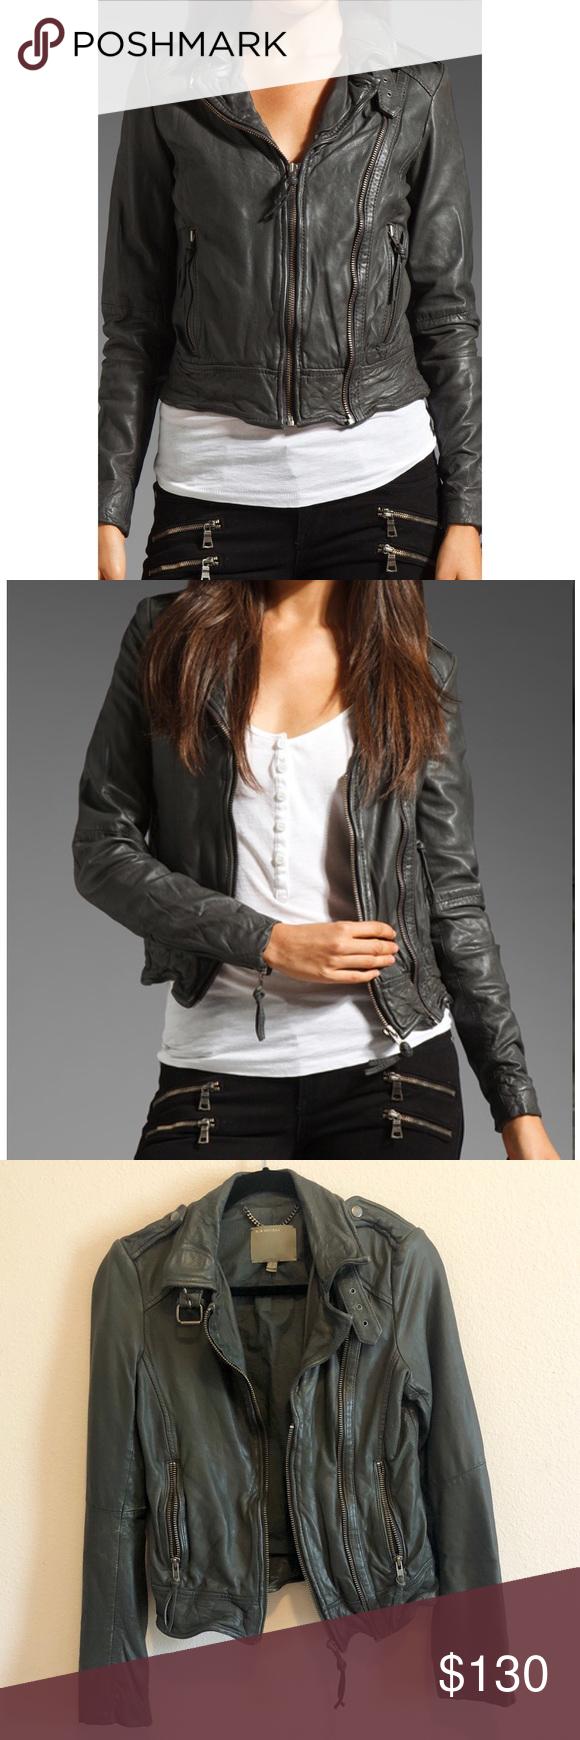 Muubaa Leather Jacket Muubaa Leather Jacket Jackets Leather Jacket [ 1740 x 580 Pixel ]